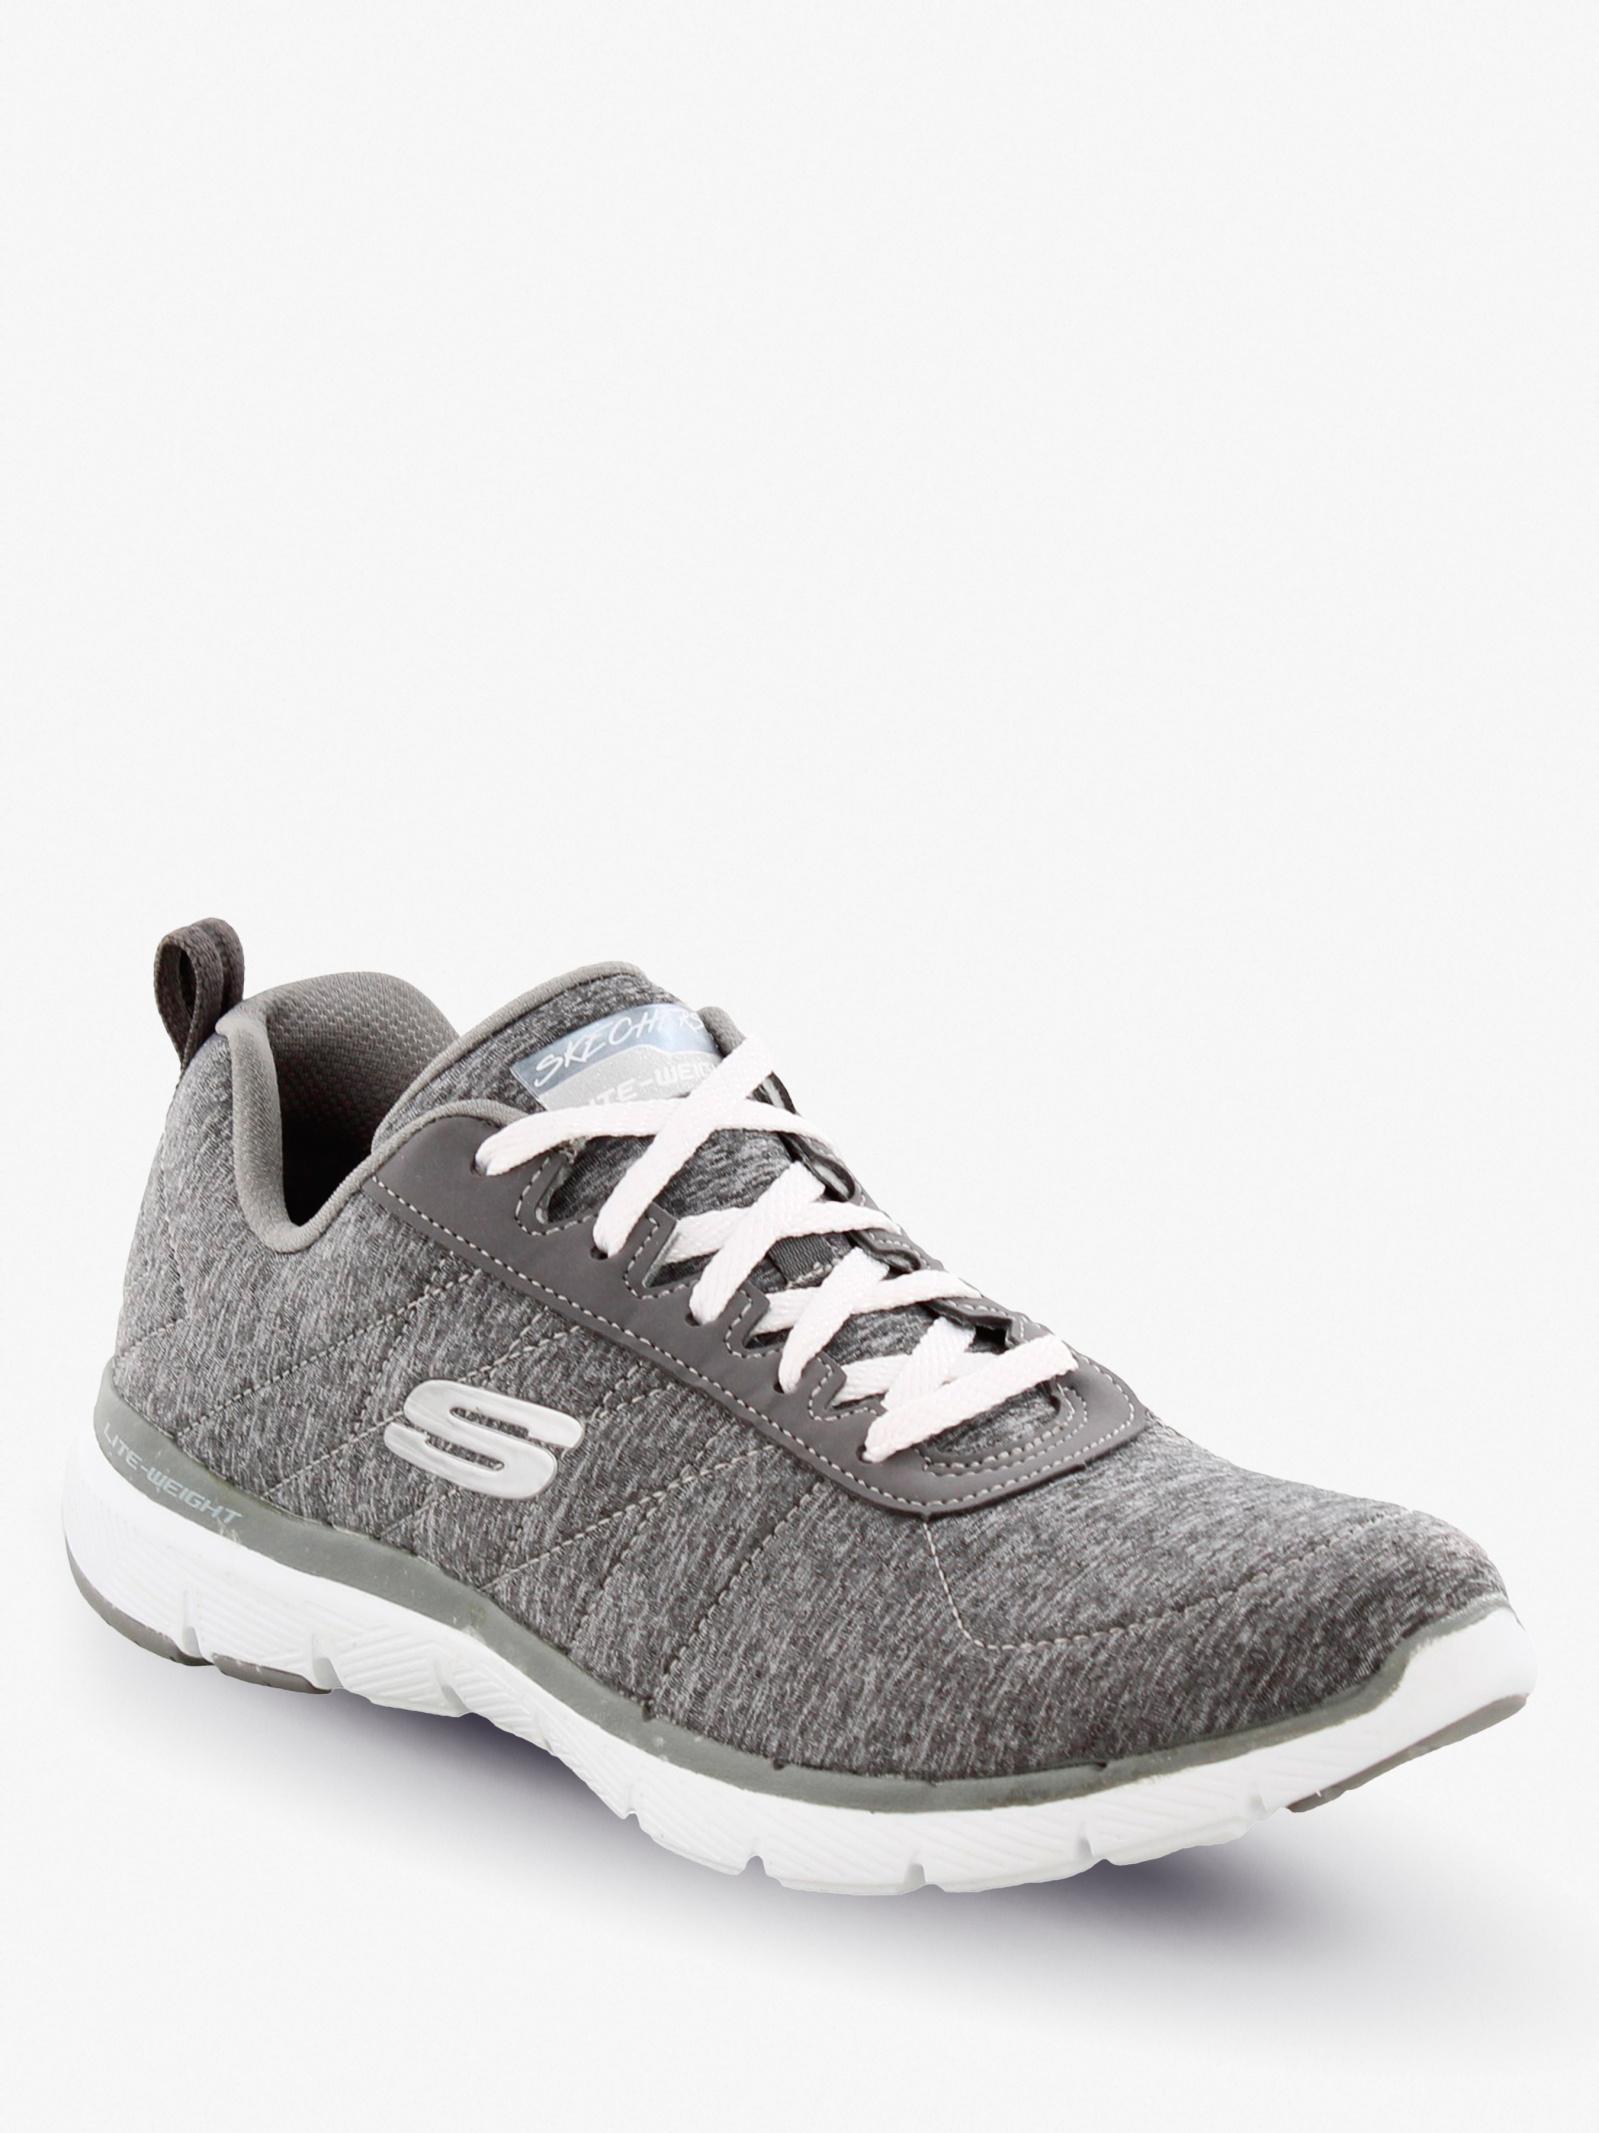 Кроссовки для женщин Skechers Sport Womens 13067W GRY фото, купить, 2017